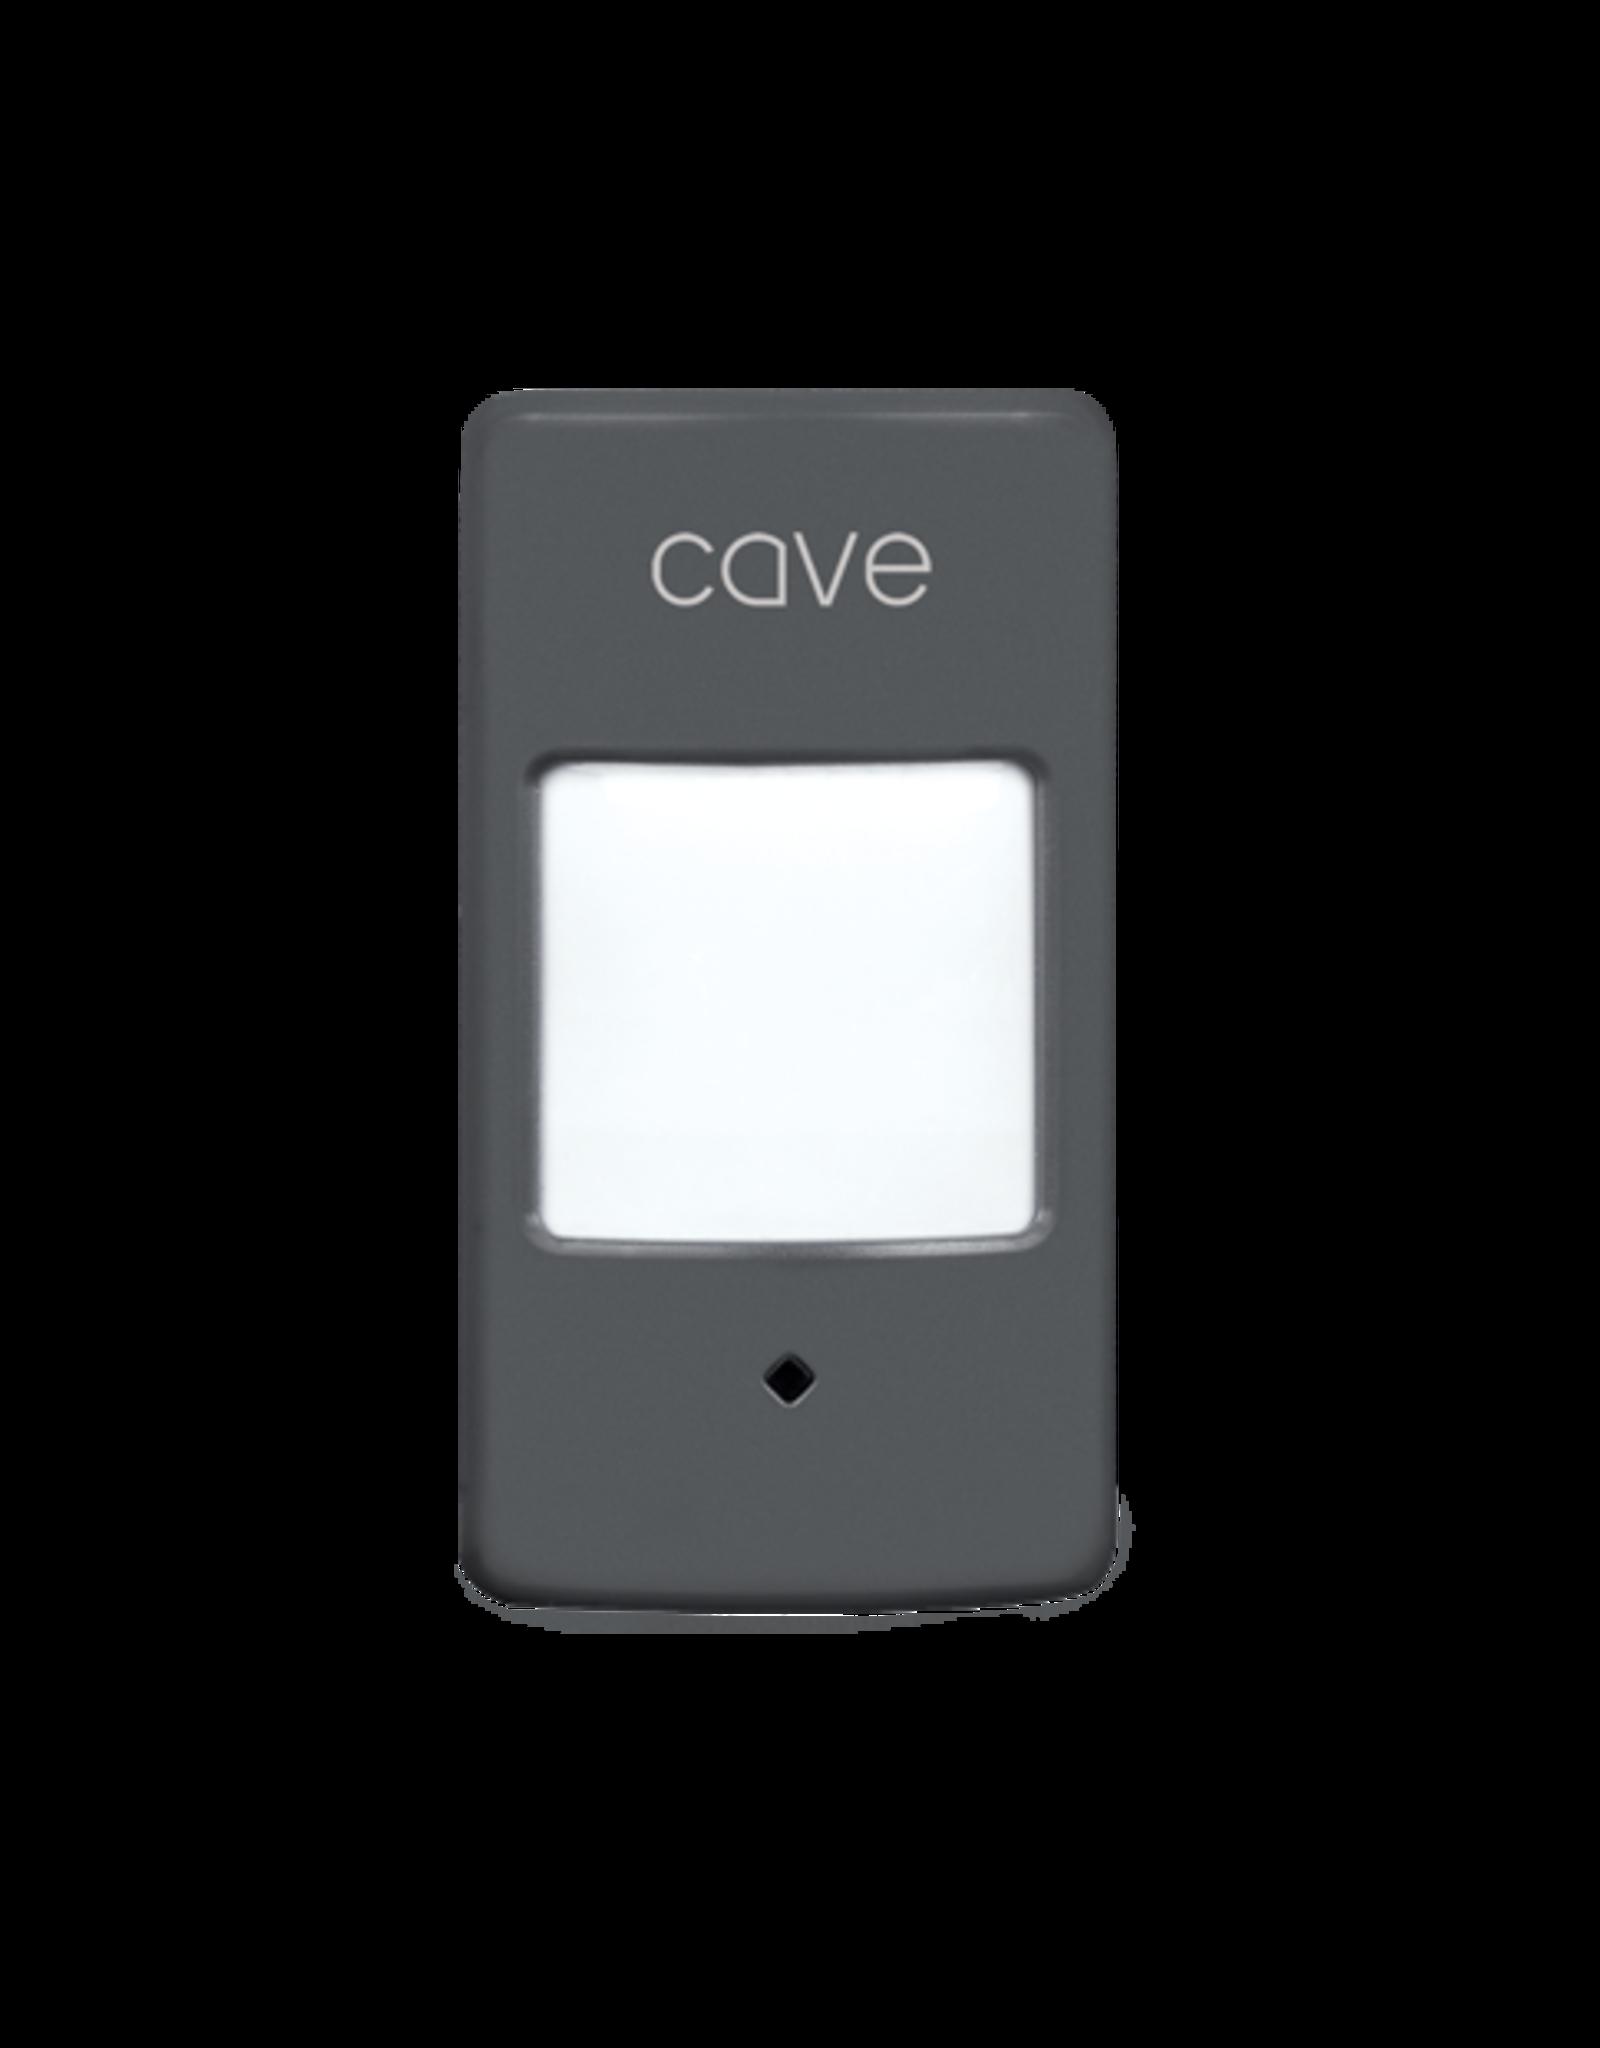 Veho Cave PIR Movement sensor